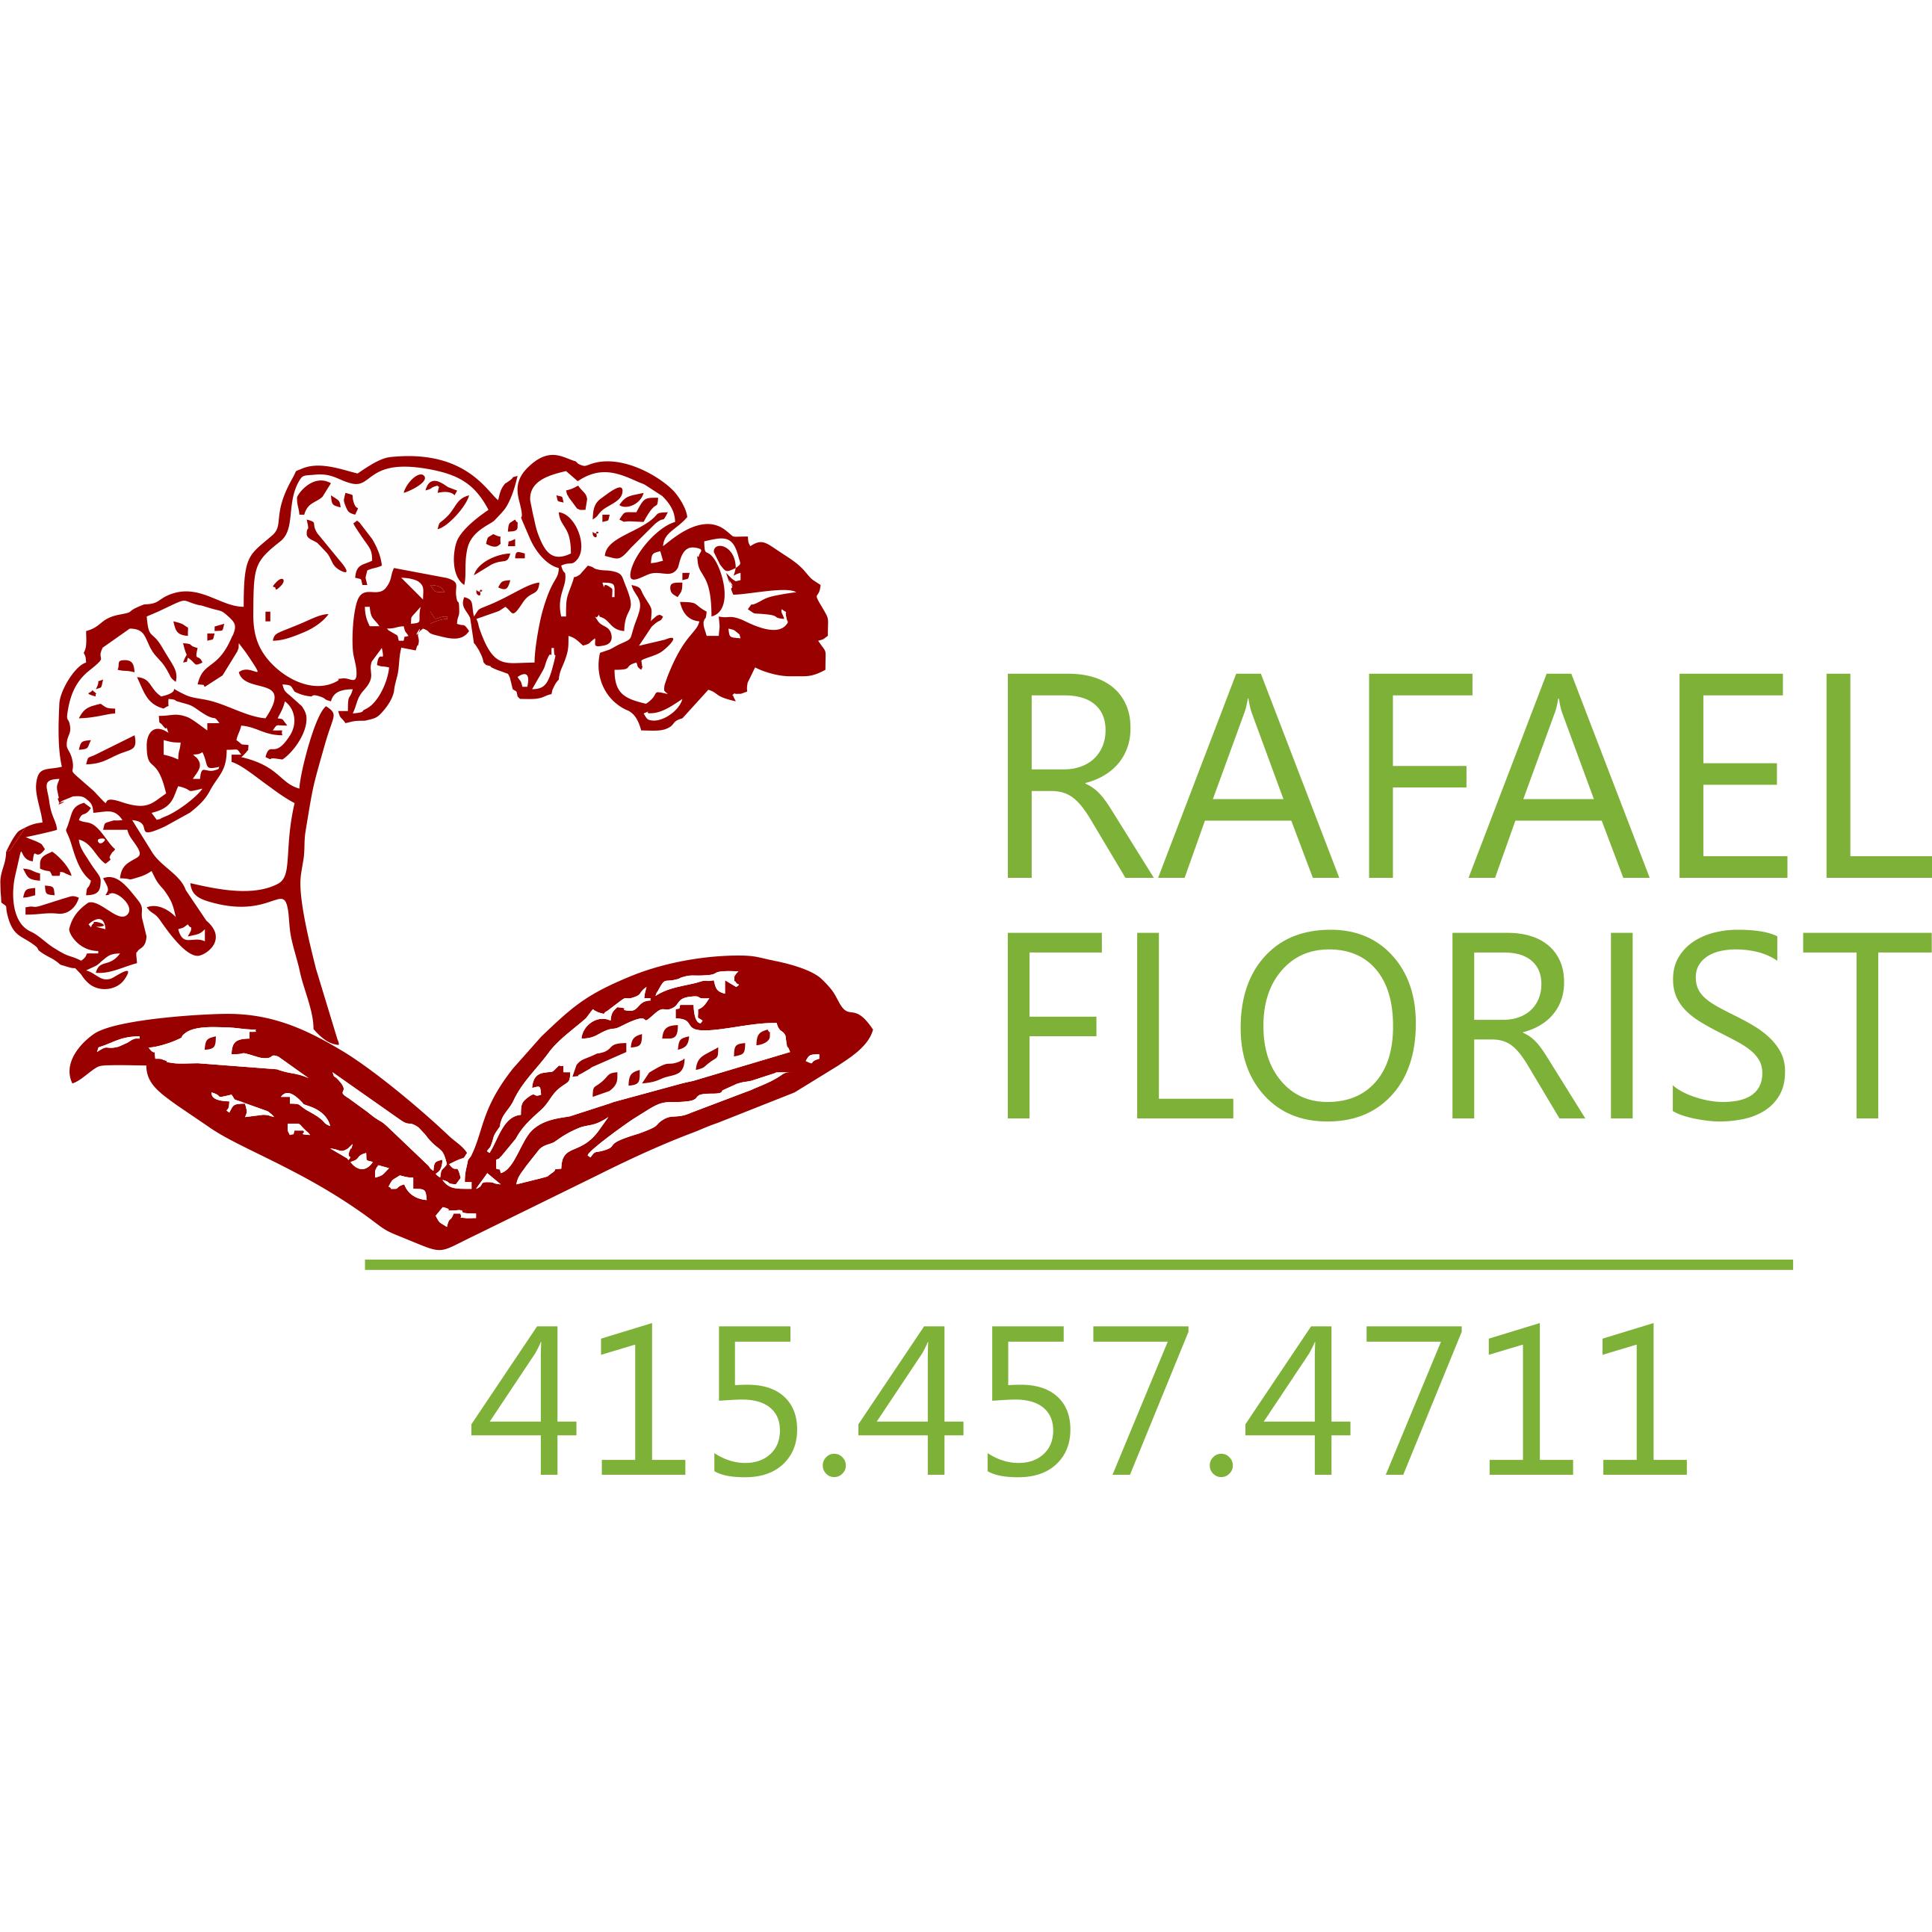 Rafael Florist - San Rafael, CA - Florists